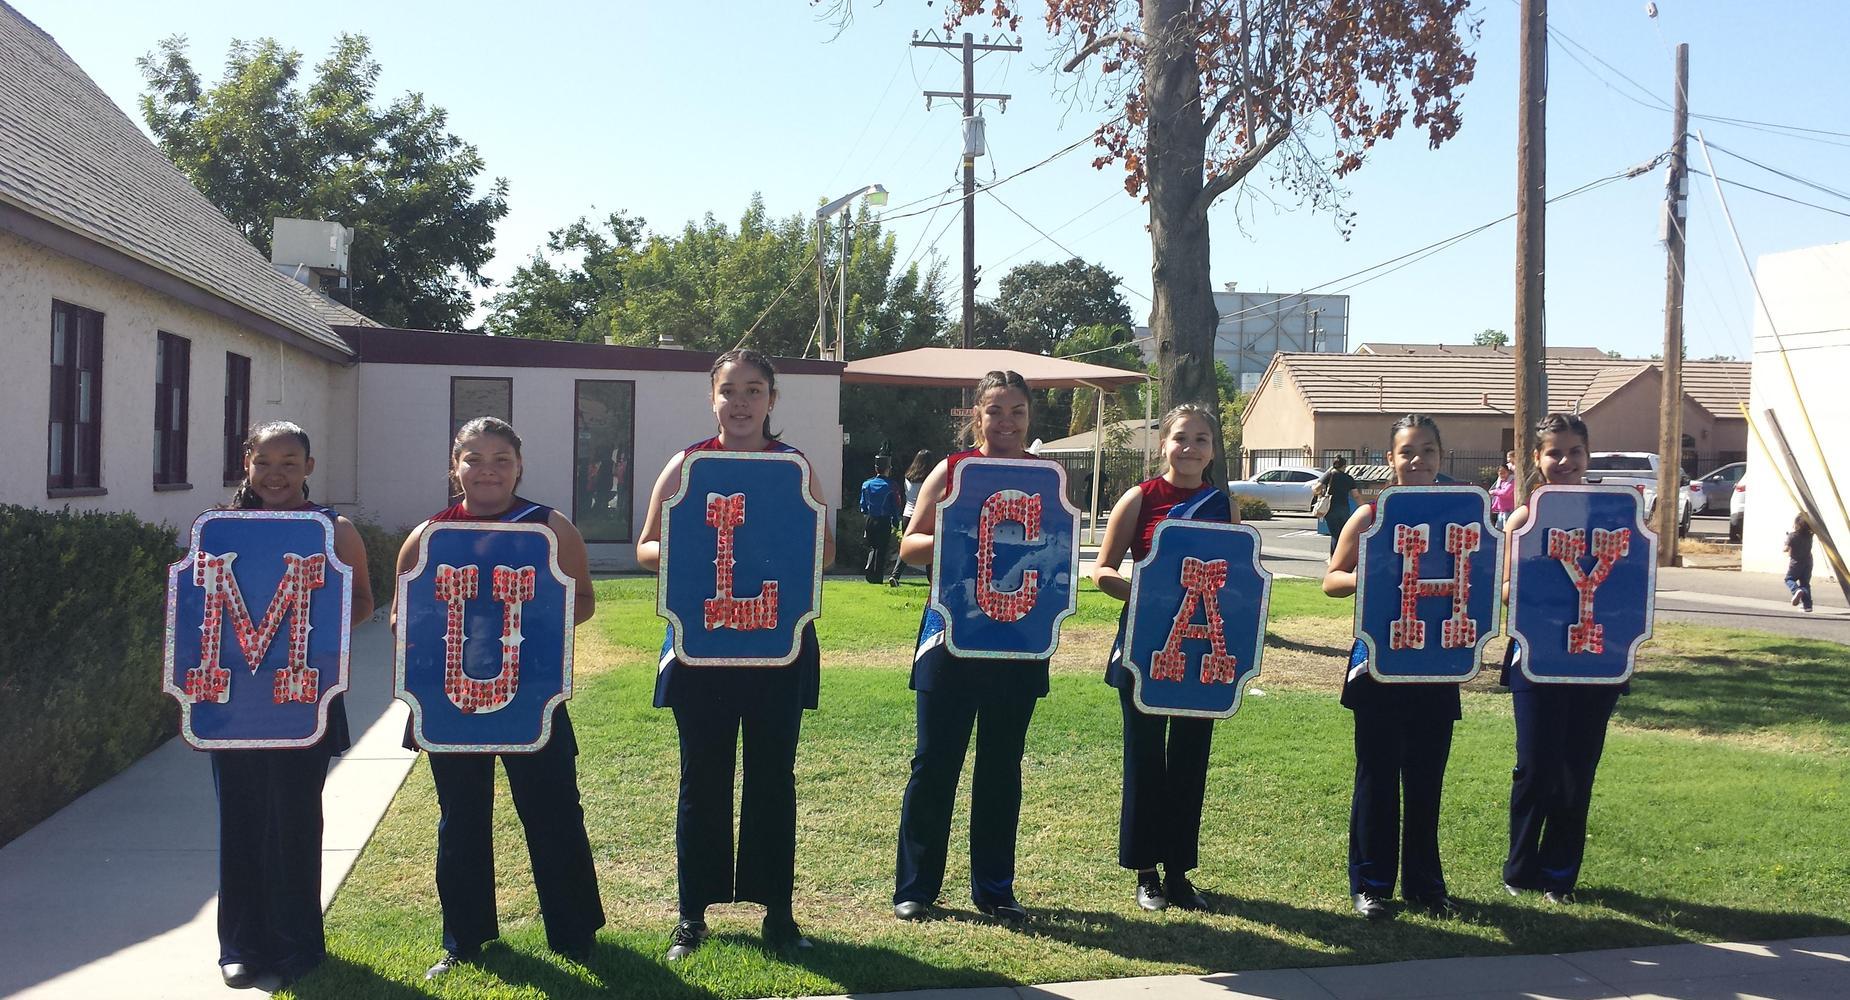 Letter girls at Fair Parade